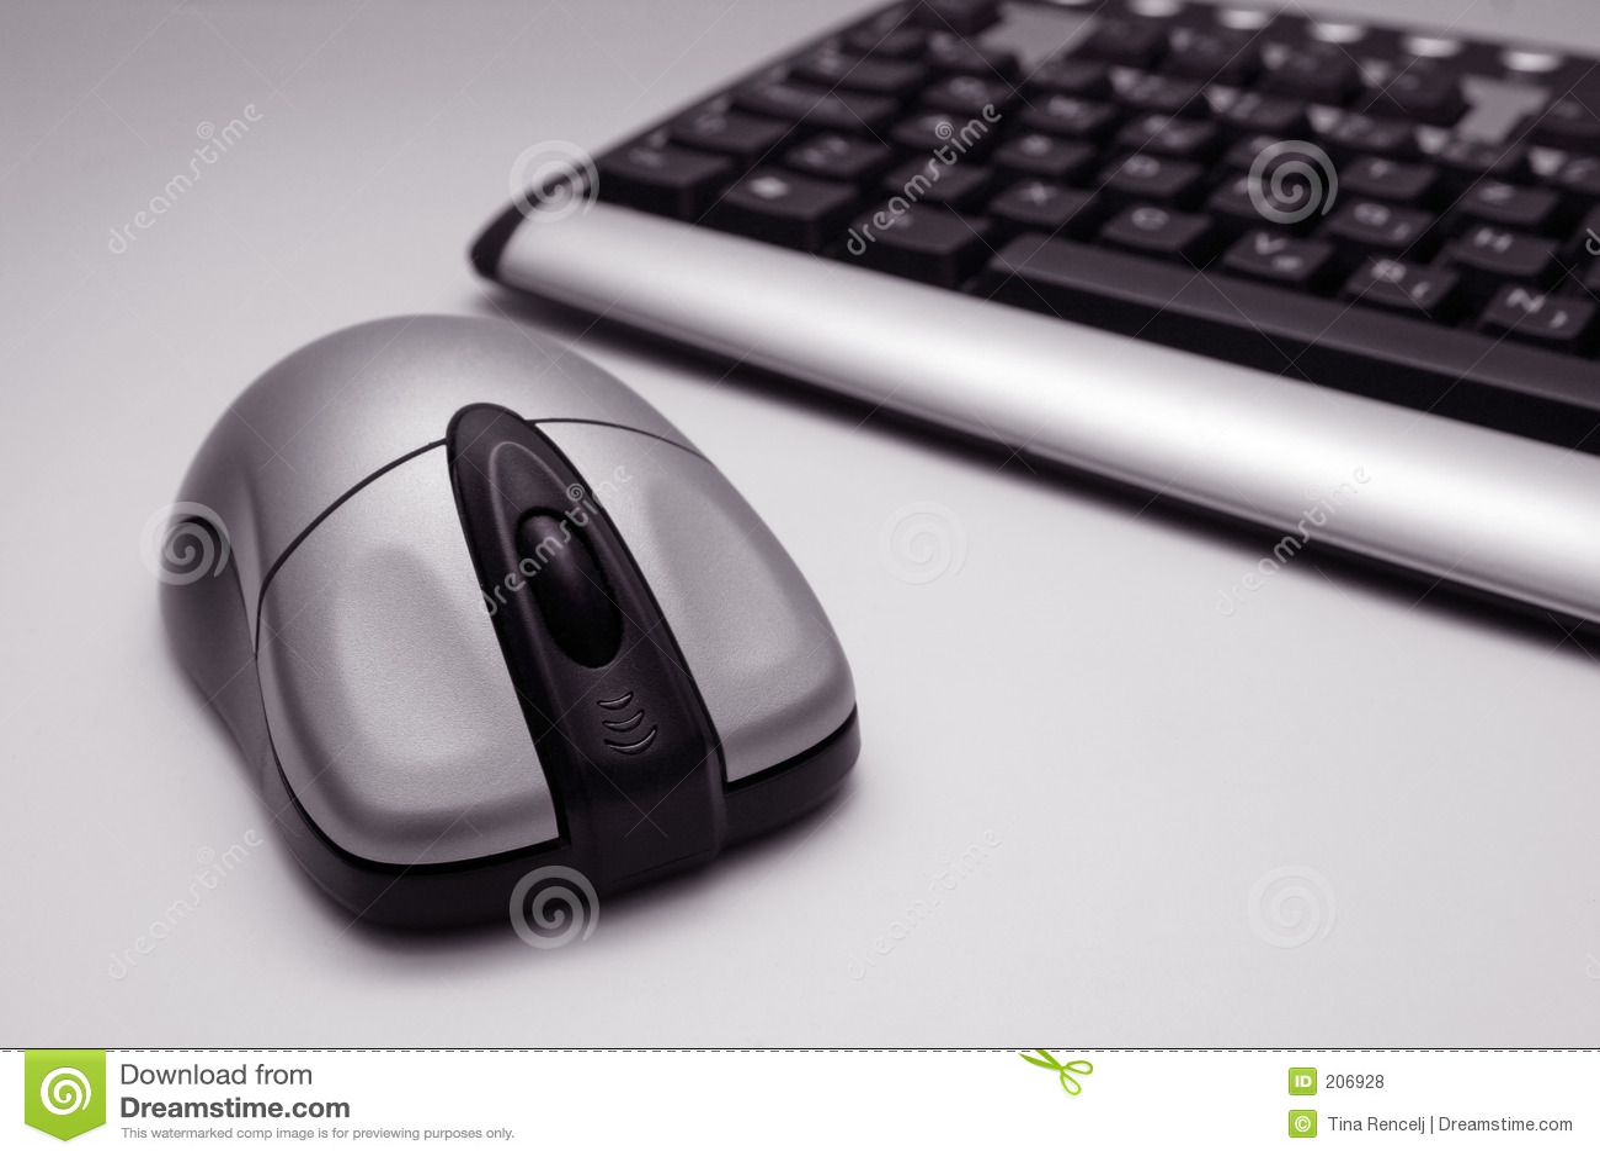 Rato e teclado sem fio